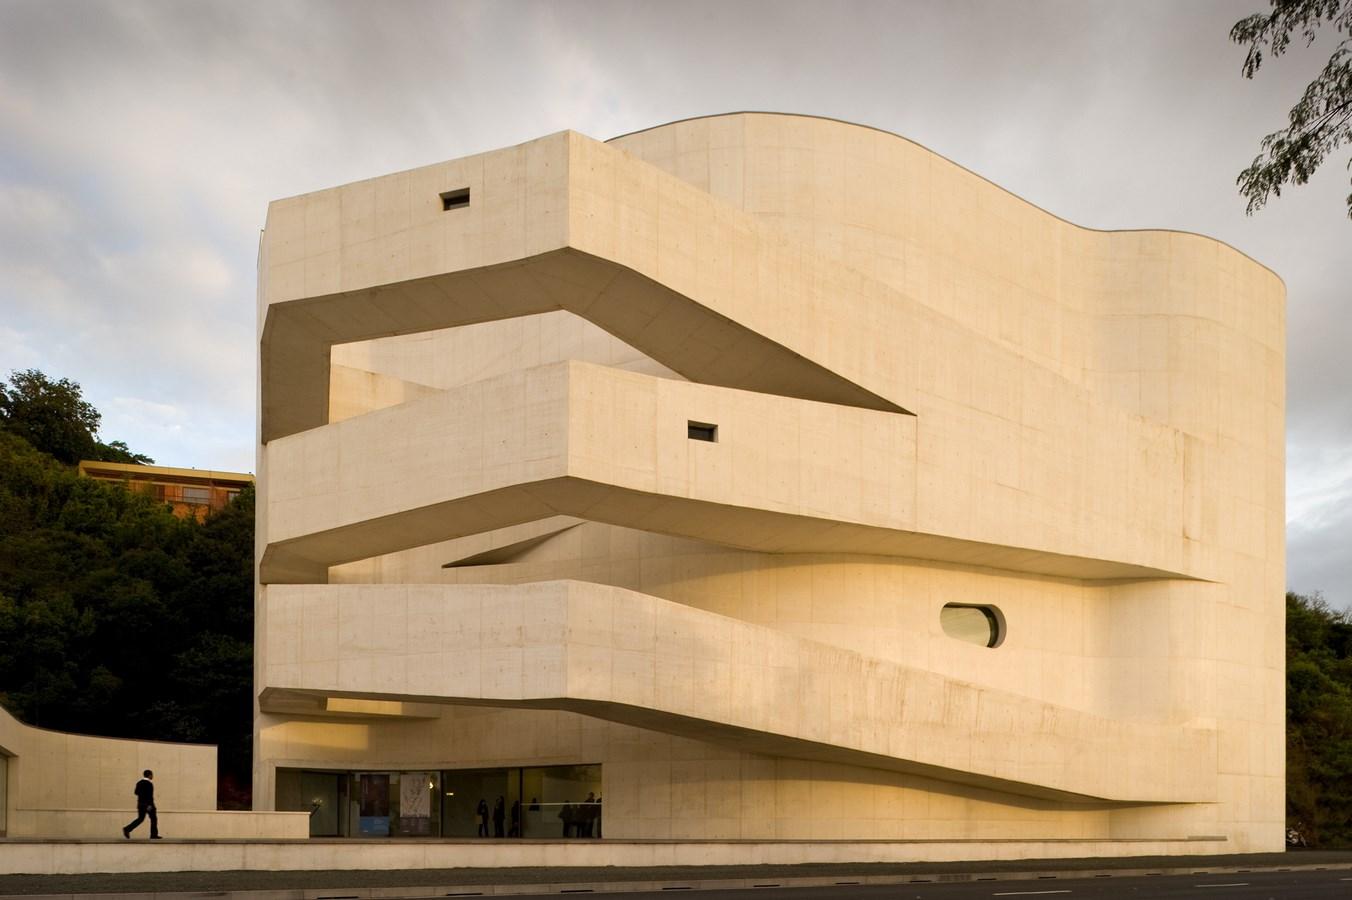 A305 - 15 Top works of Alvaro Siza - Iberê Camargo Foundation